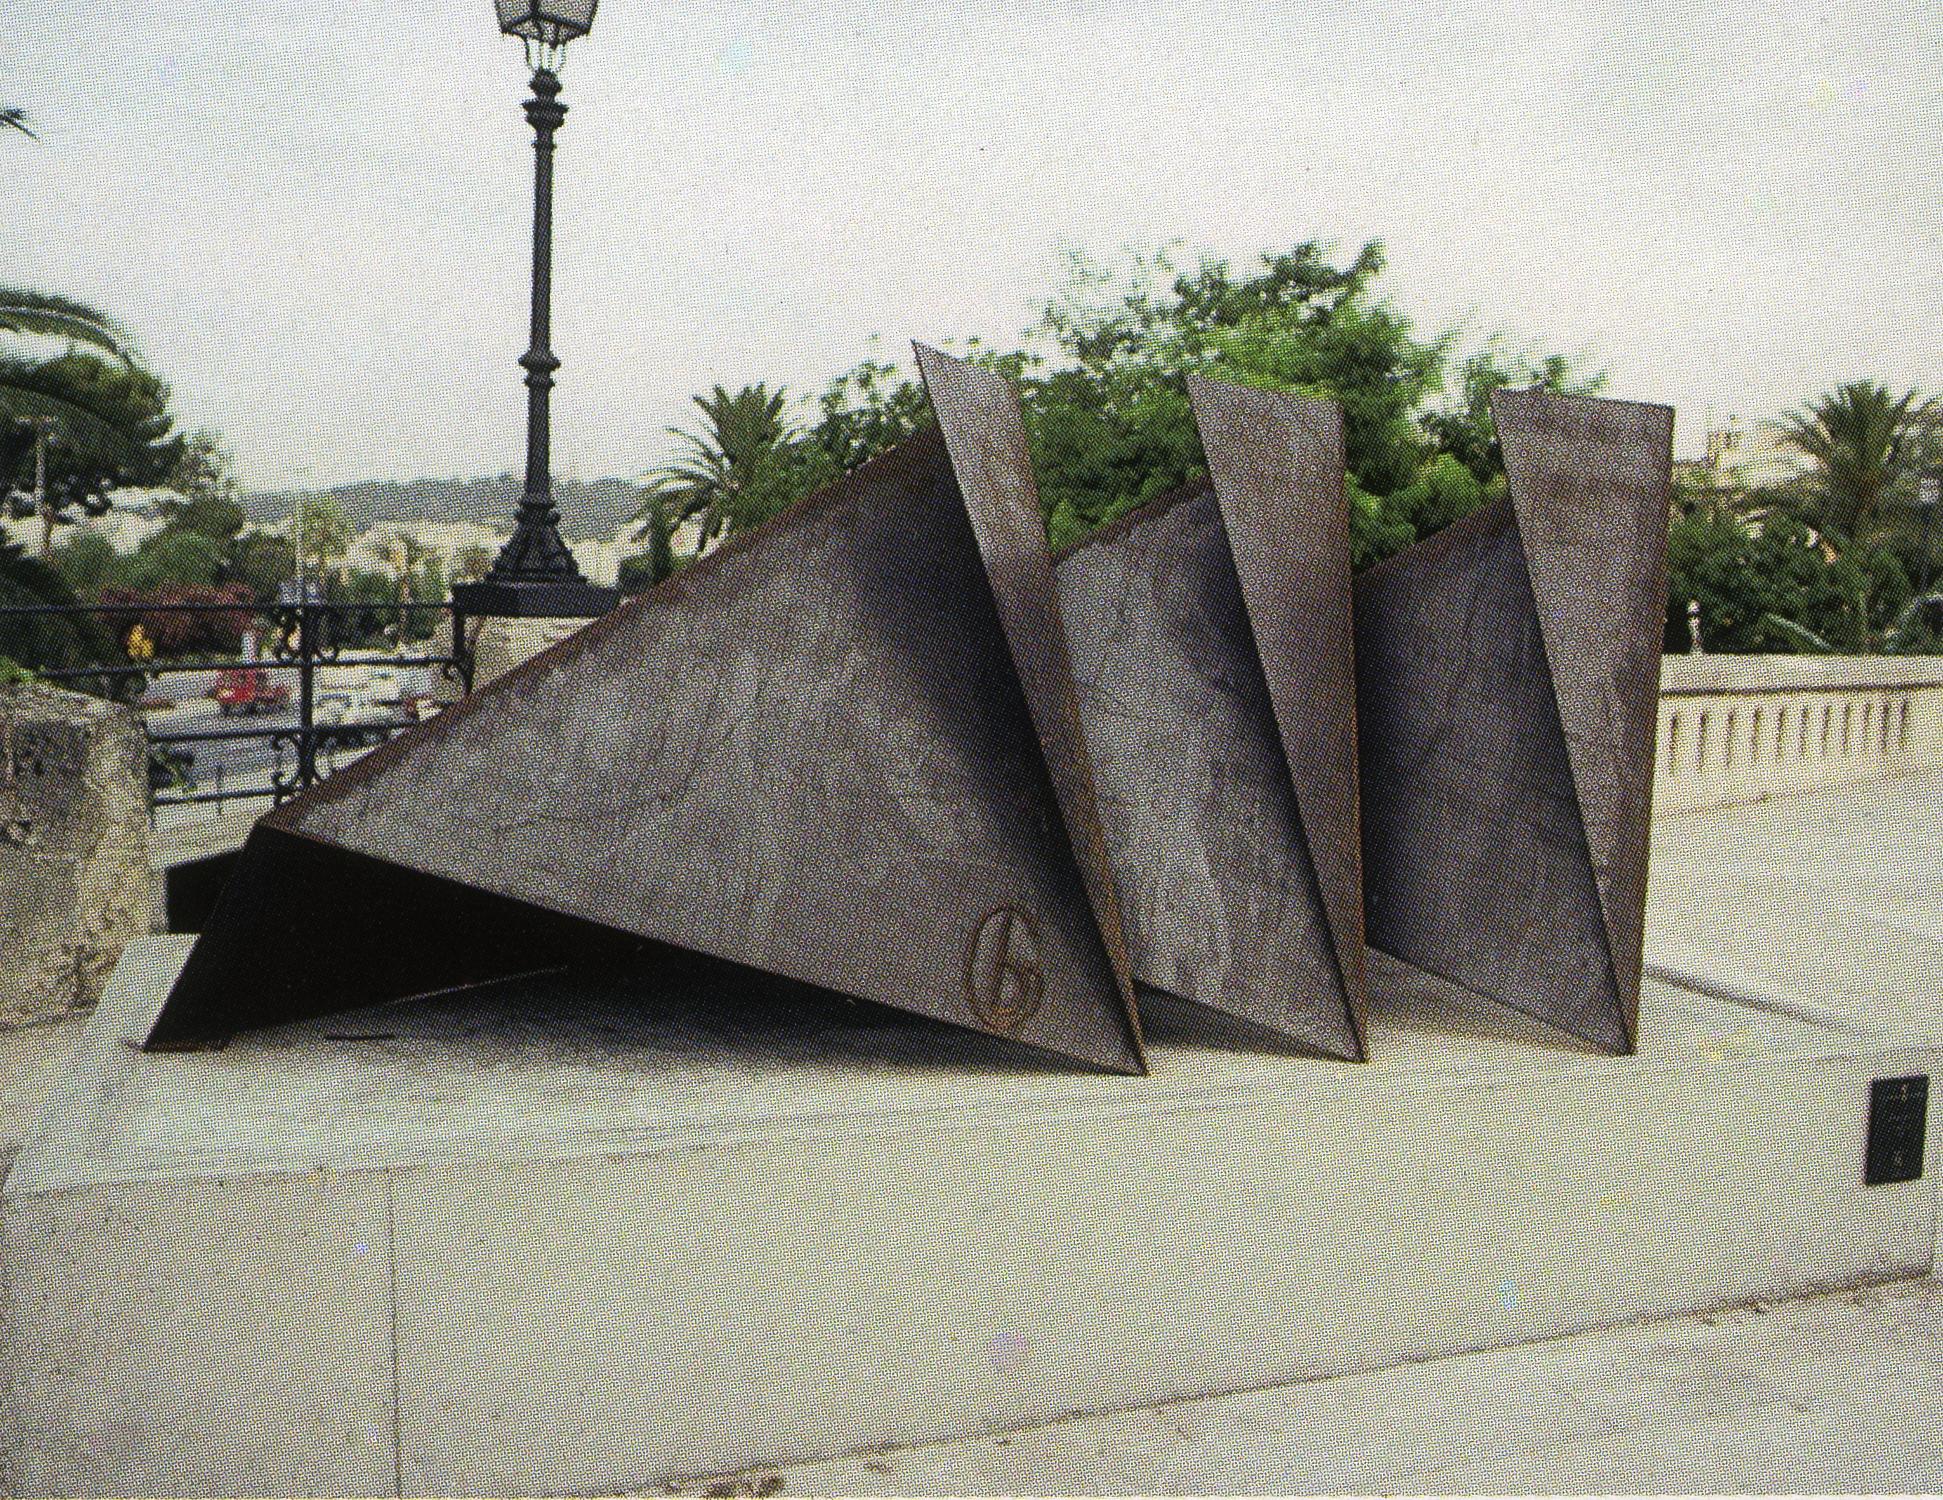 City of Palma de Mallorca, Baleares, Spain; 1999.  Titóni.  4' x 8' x 5'